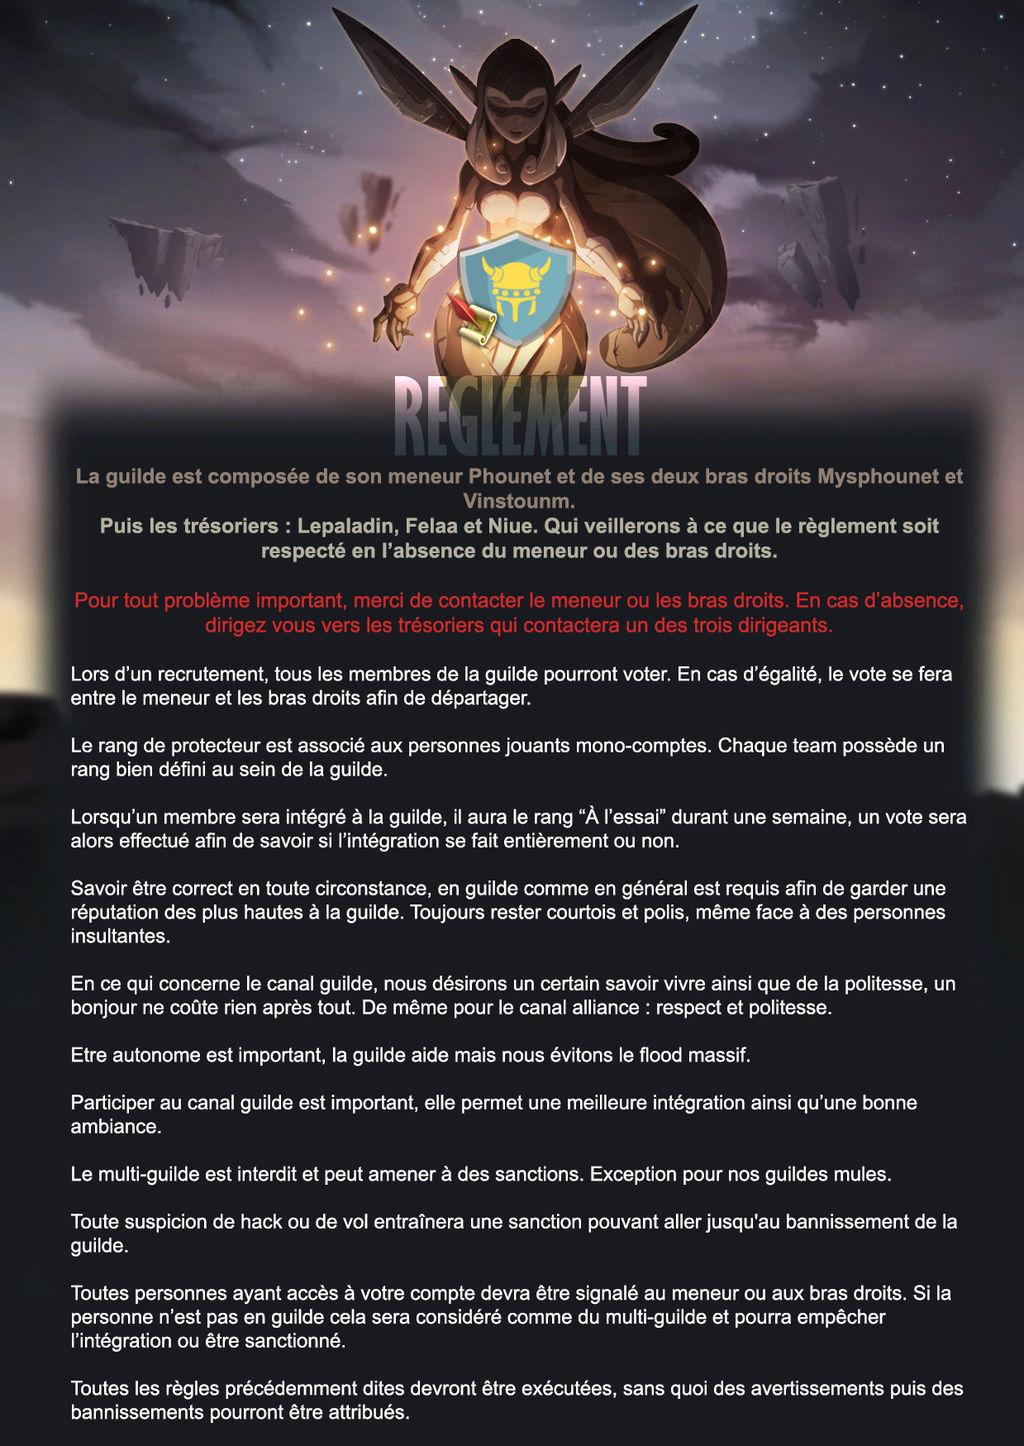 Les Règles de la guilde   Rygles11